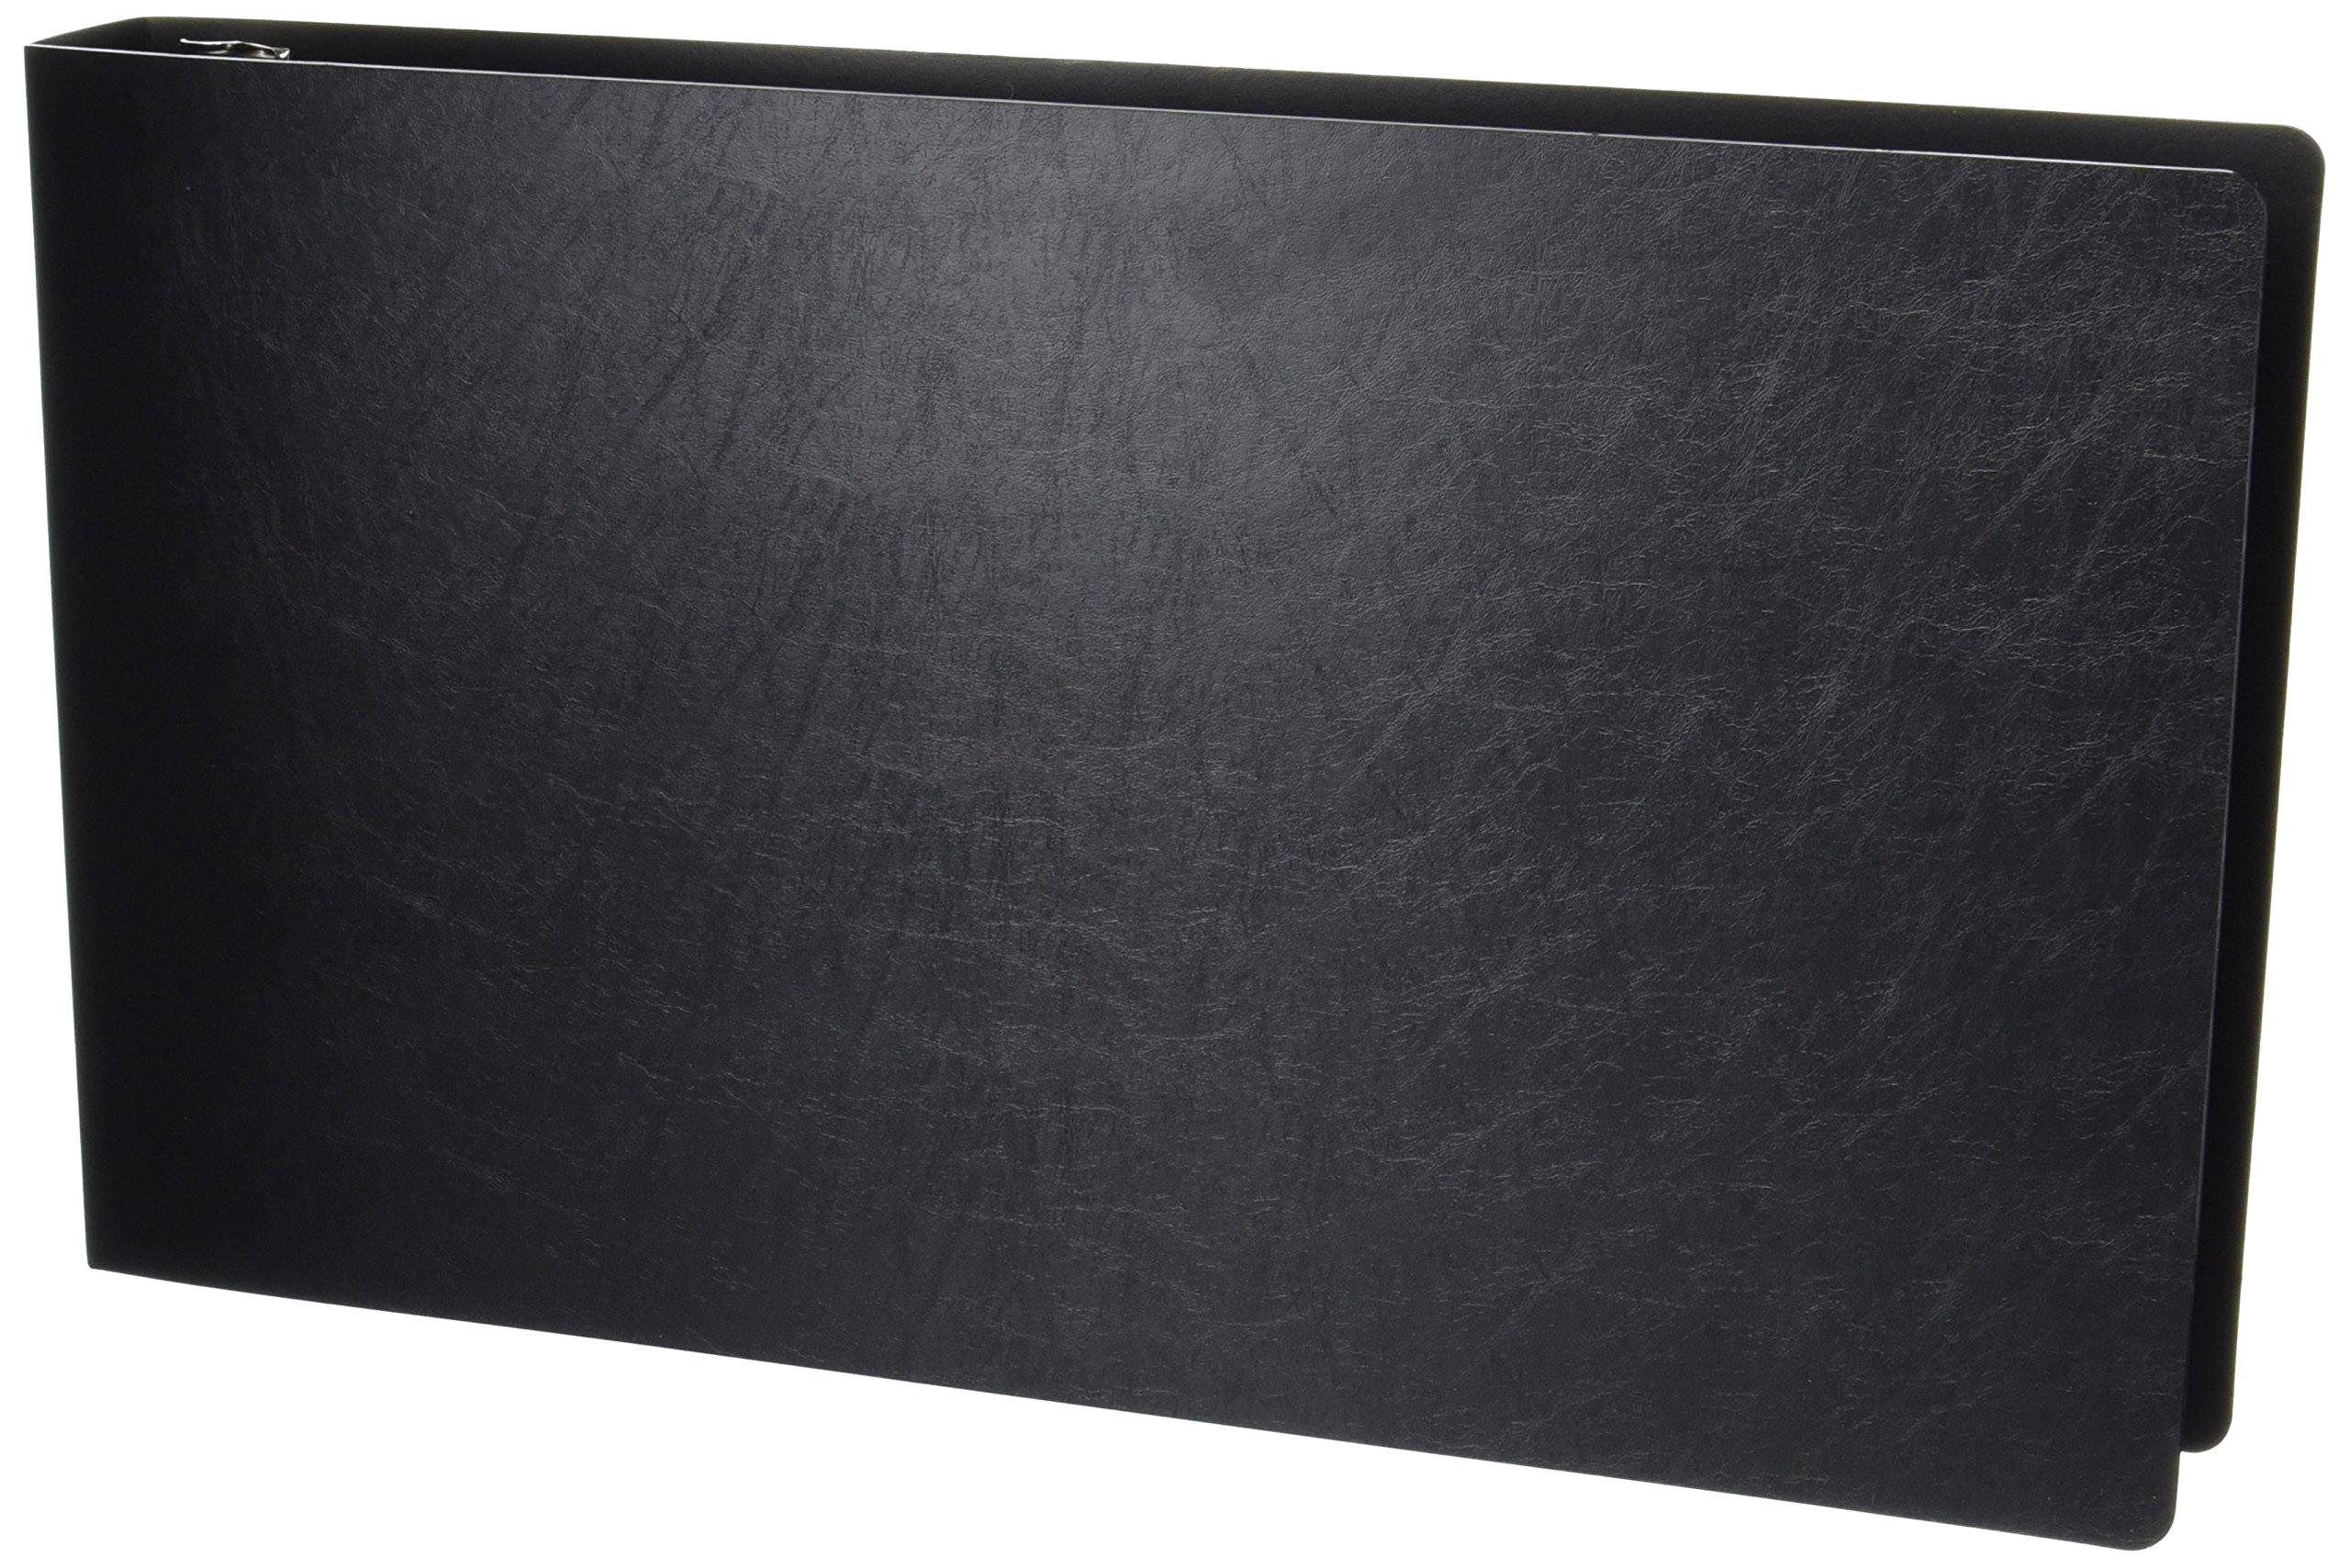 11x17 1-1/2'' Angle-D Ring, Black Poly Binder (516610)